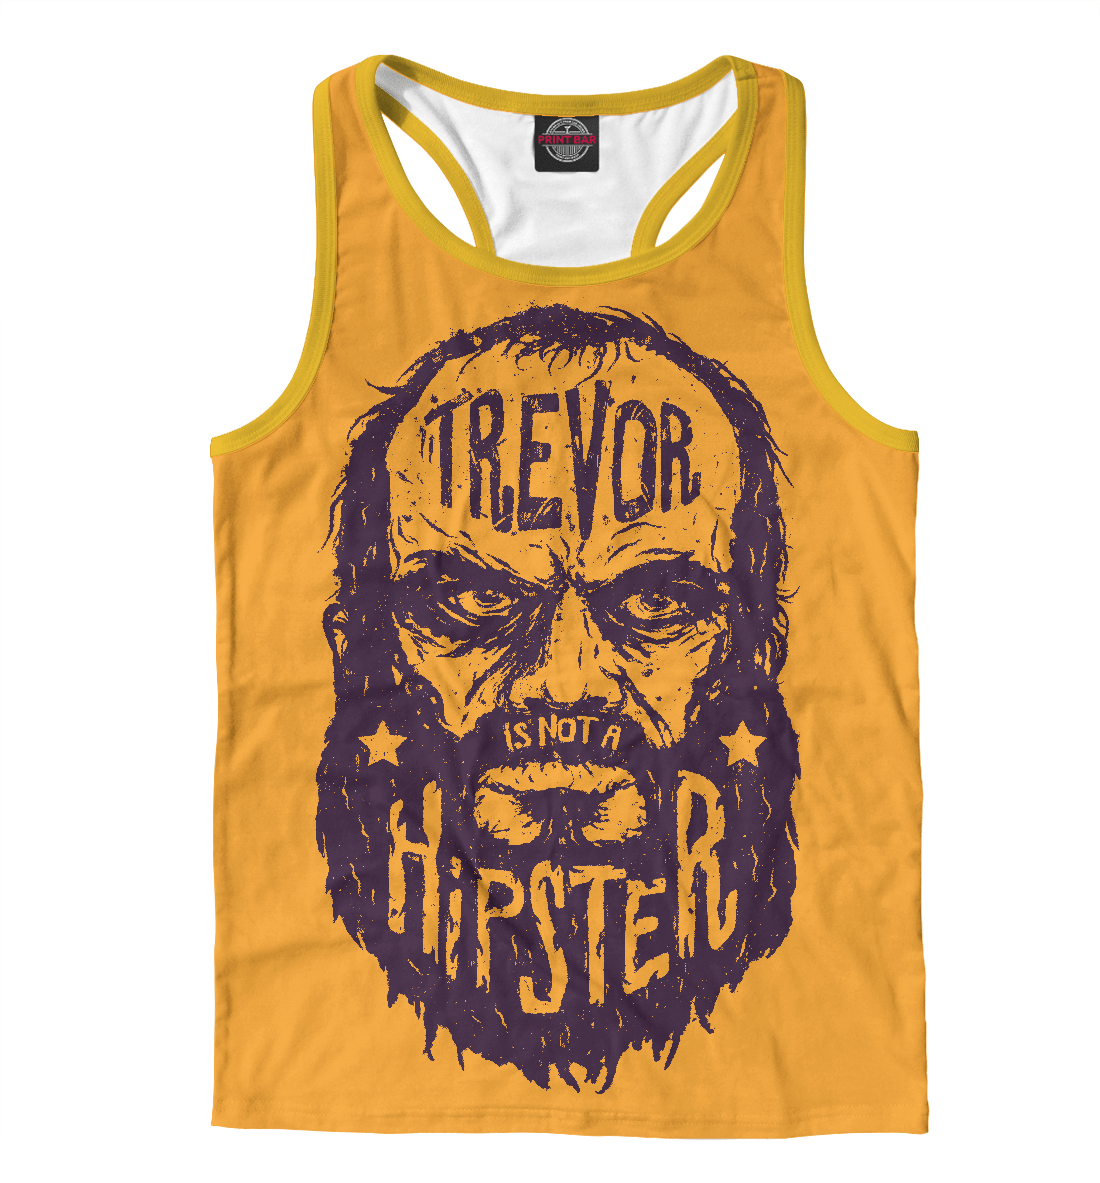 Купить Тревор не хипстер, Printbar, Майки борцовки, HIP-796339-mayb-2